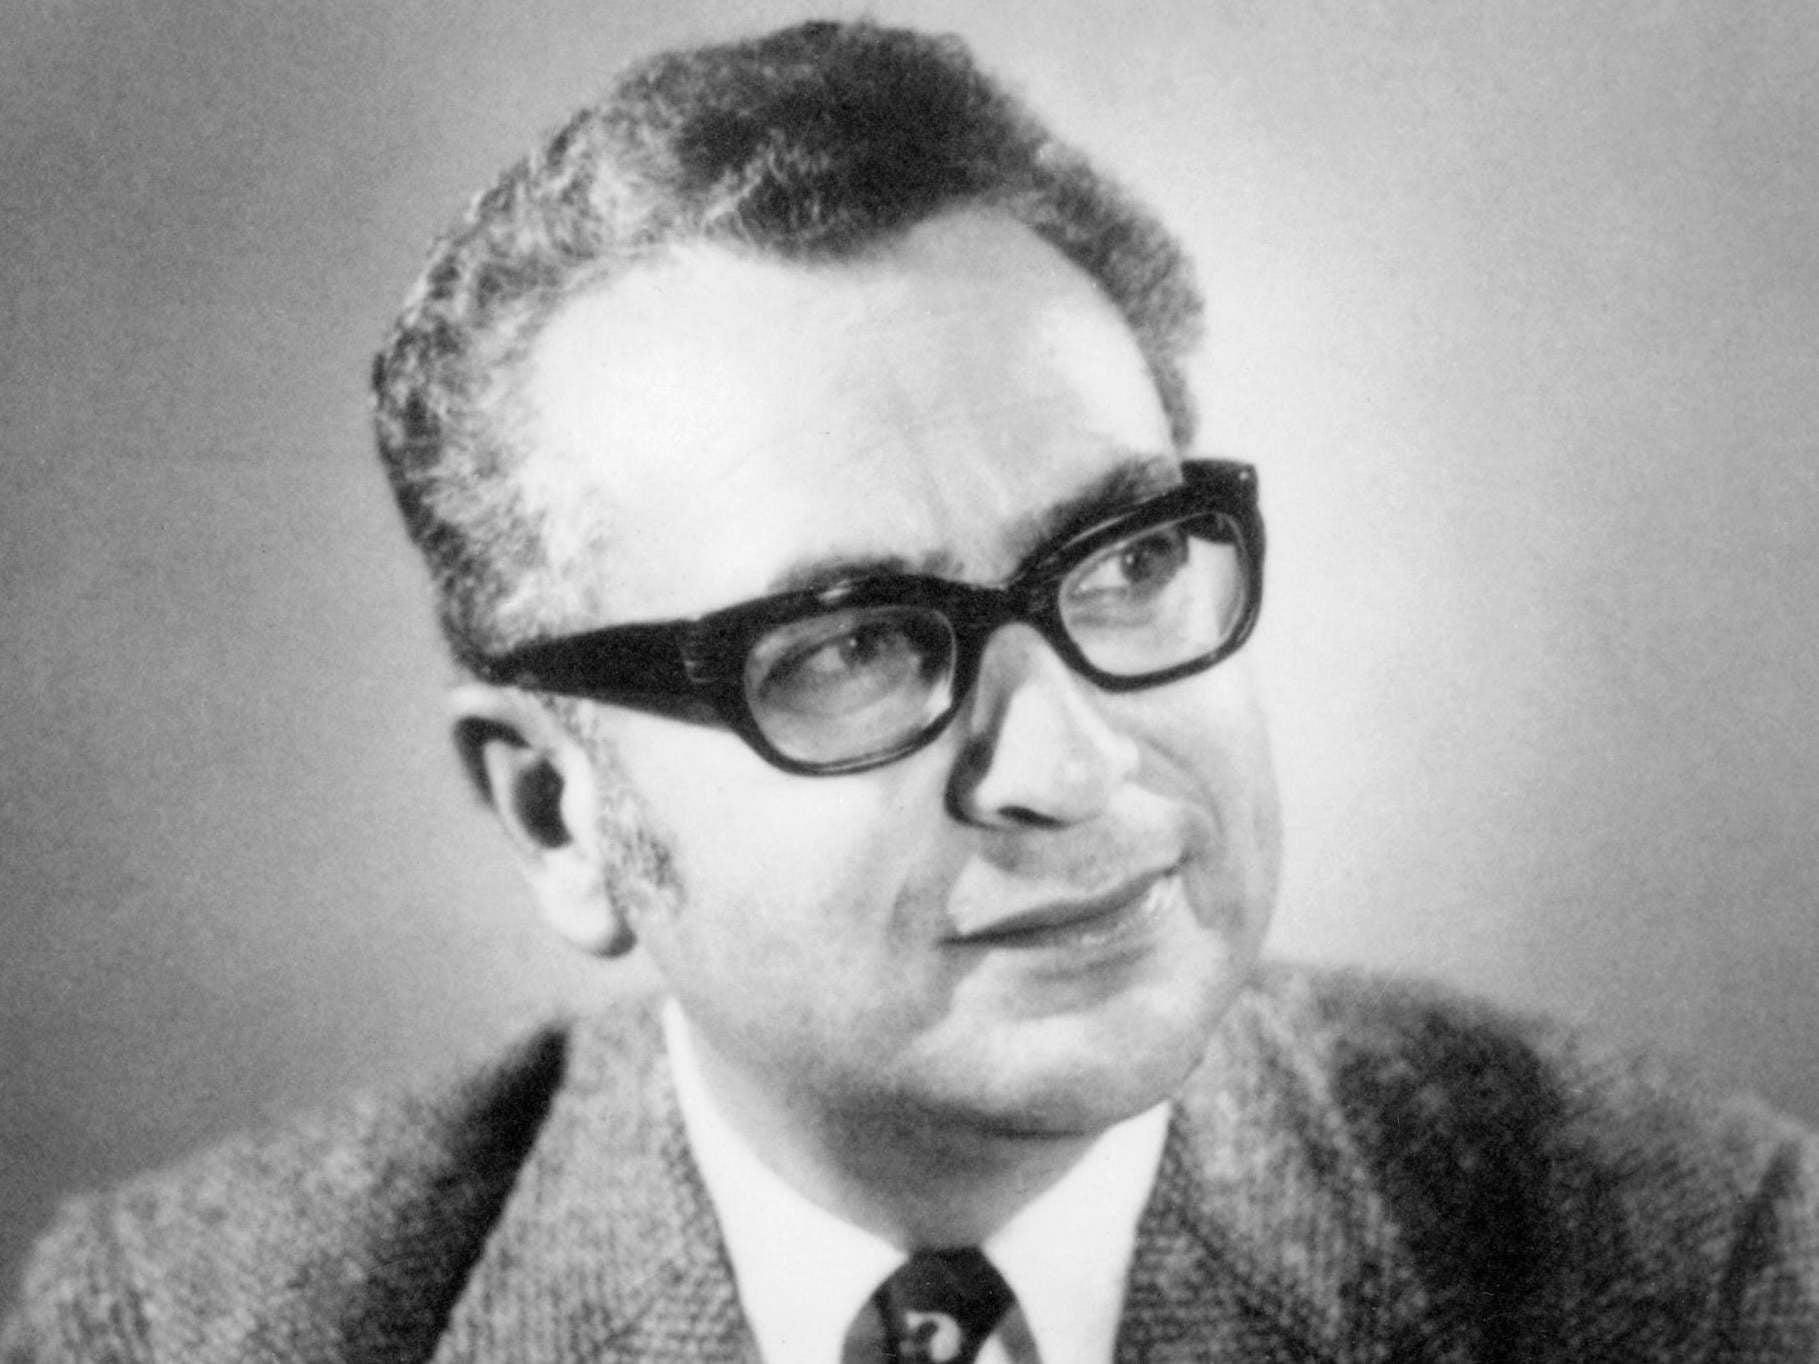 Murray Gell-Mann: Nobel prize-winning scientist who identified quarks